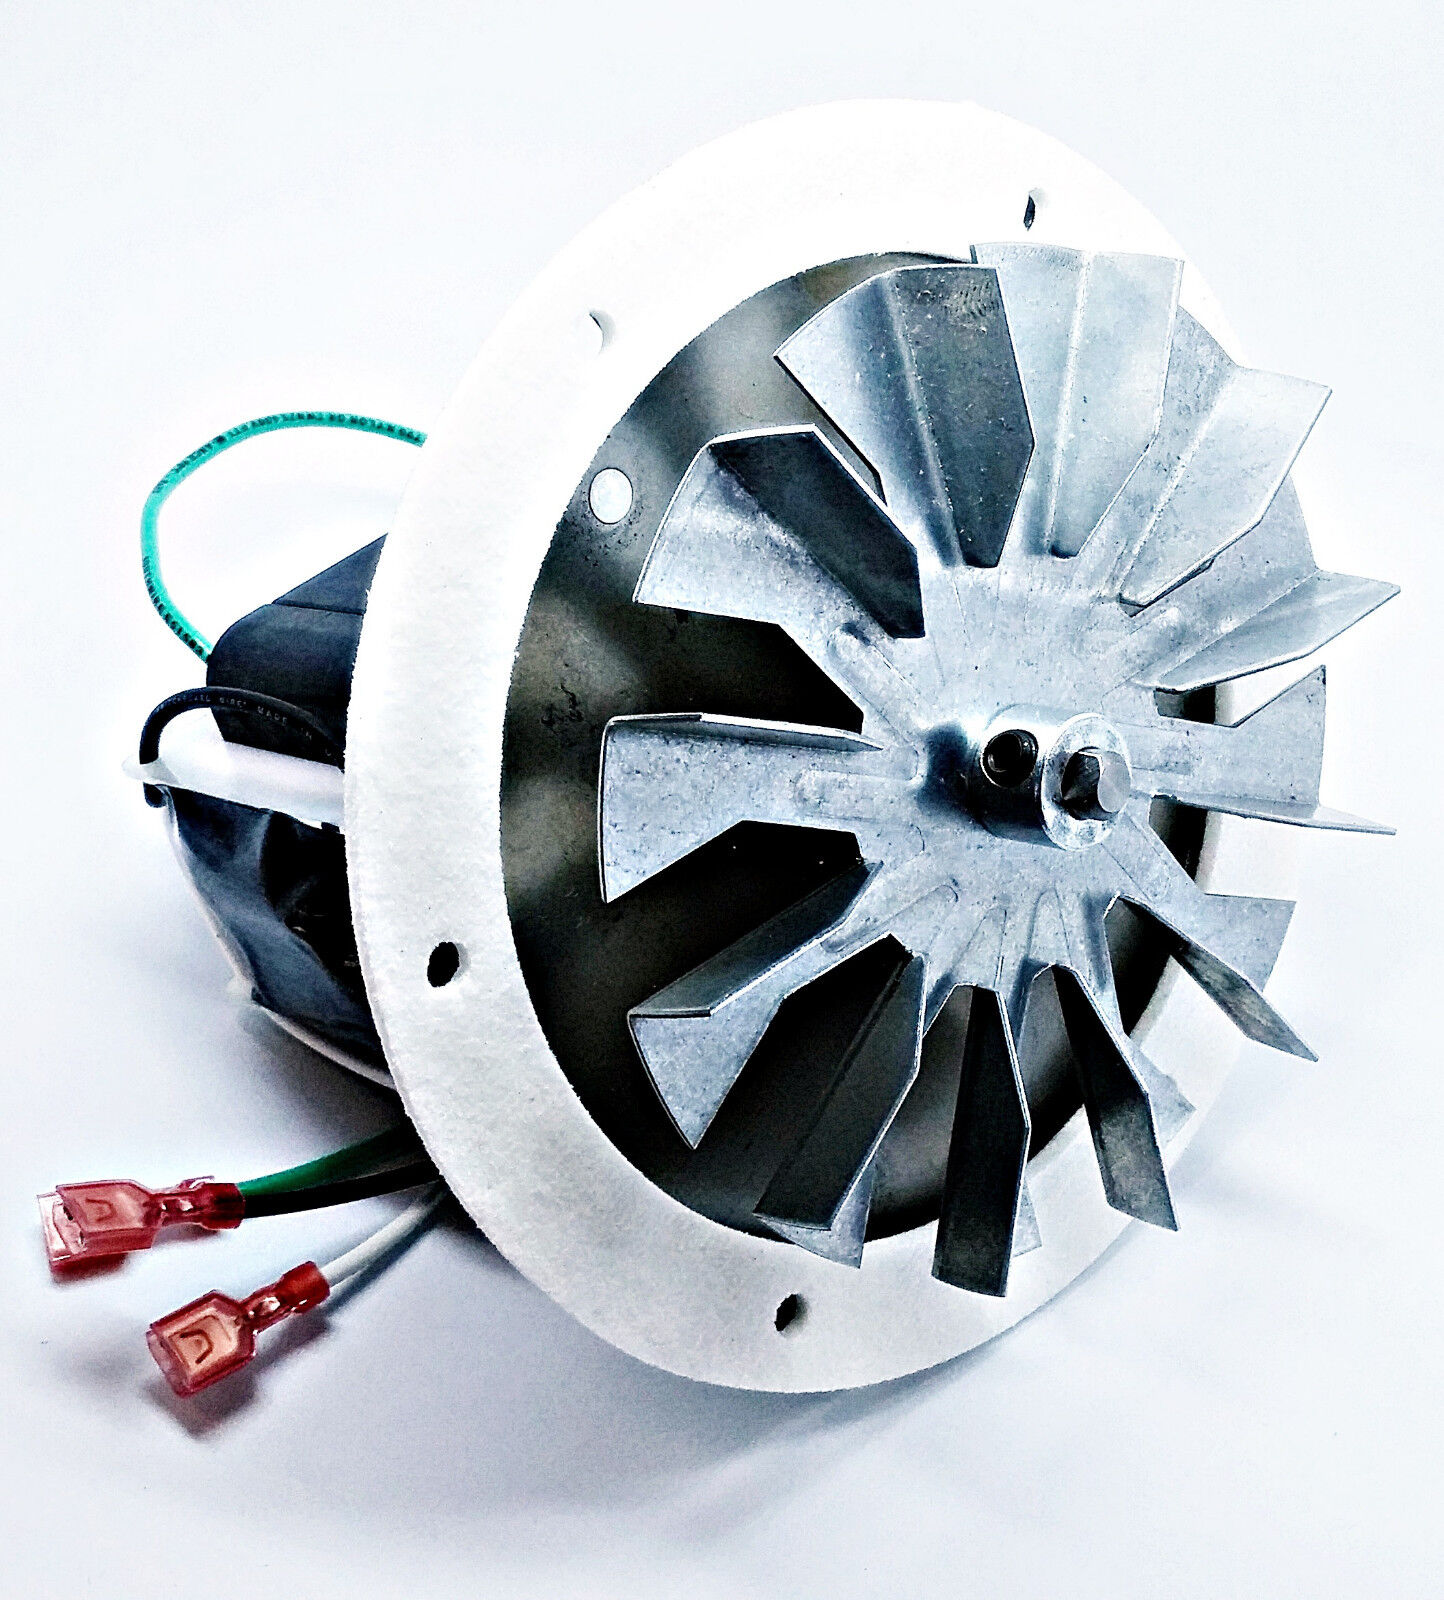 Regency GFI55, Combustion Exhaust Motor Fan + 4 3 4  - GF55-002, PH-UNIVCOMBKIT